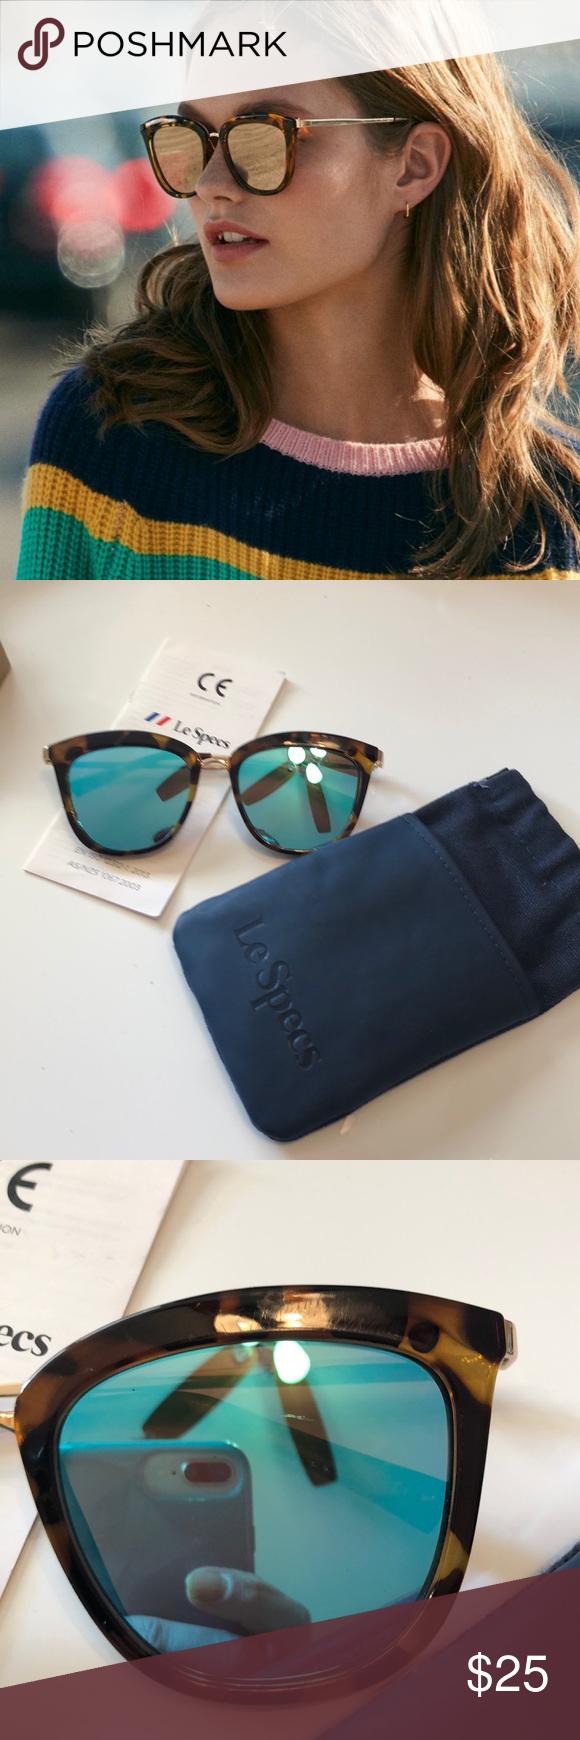 ff5436335d9 Le Specs Caliente 53mm Cat Eye Sunglasses Dramatic cat-eye frames add  unmistakable retro allure